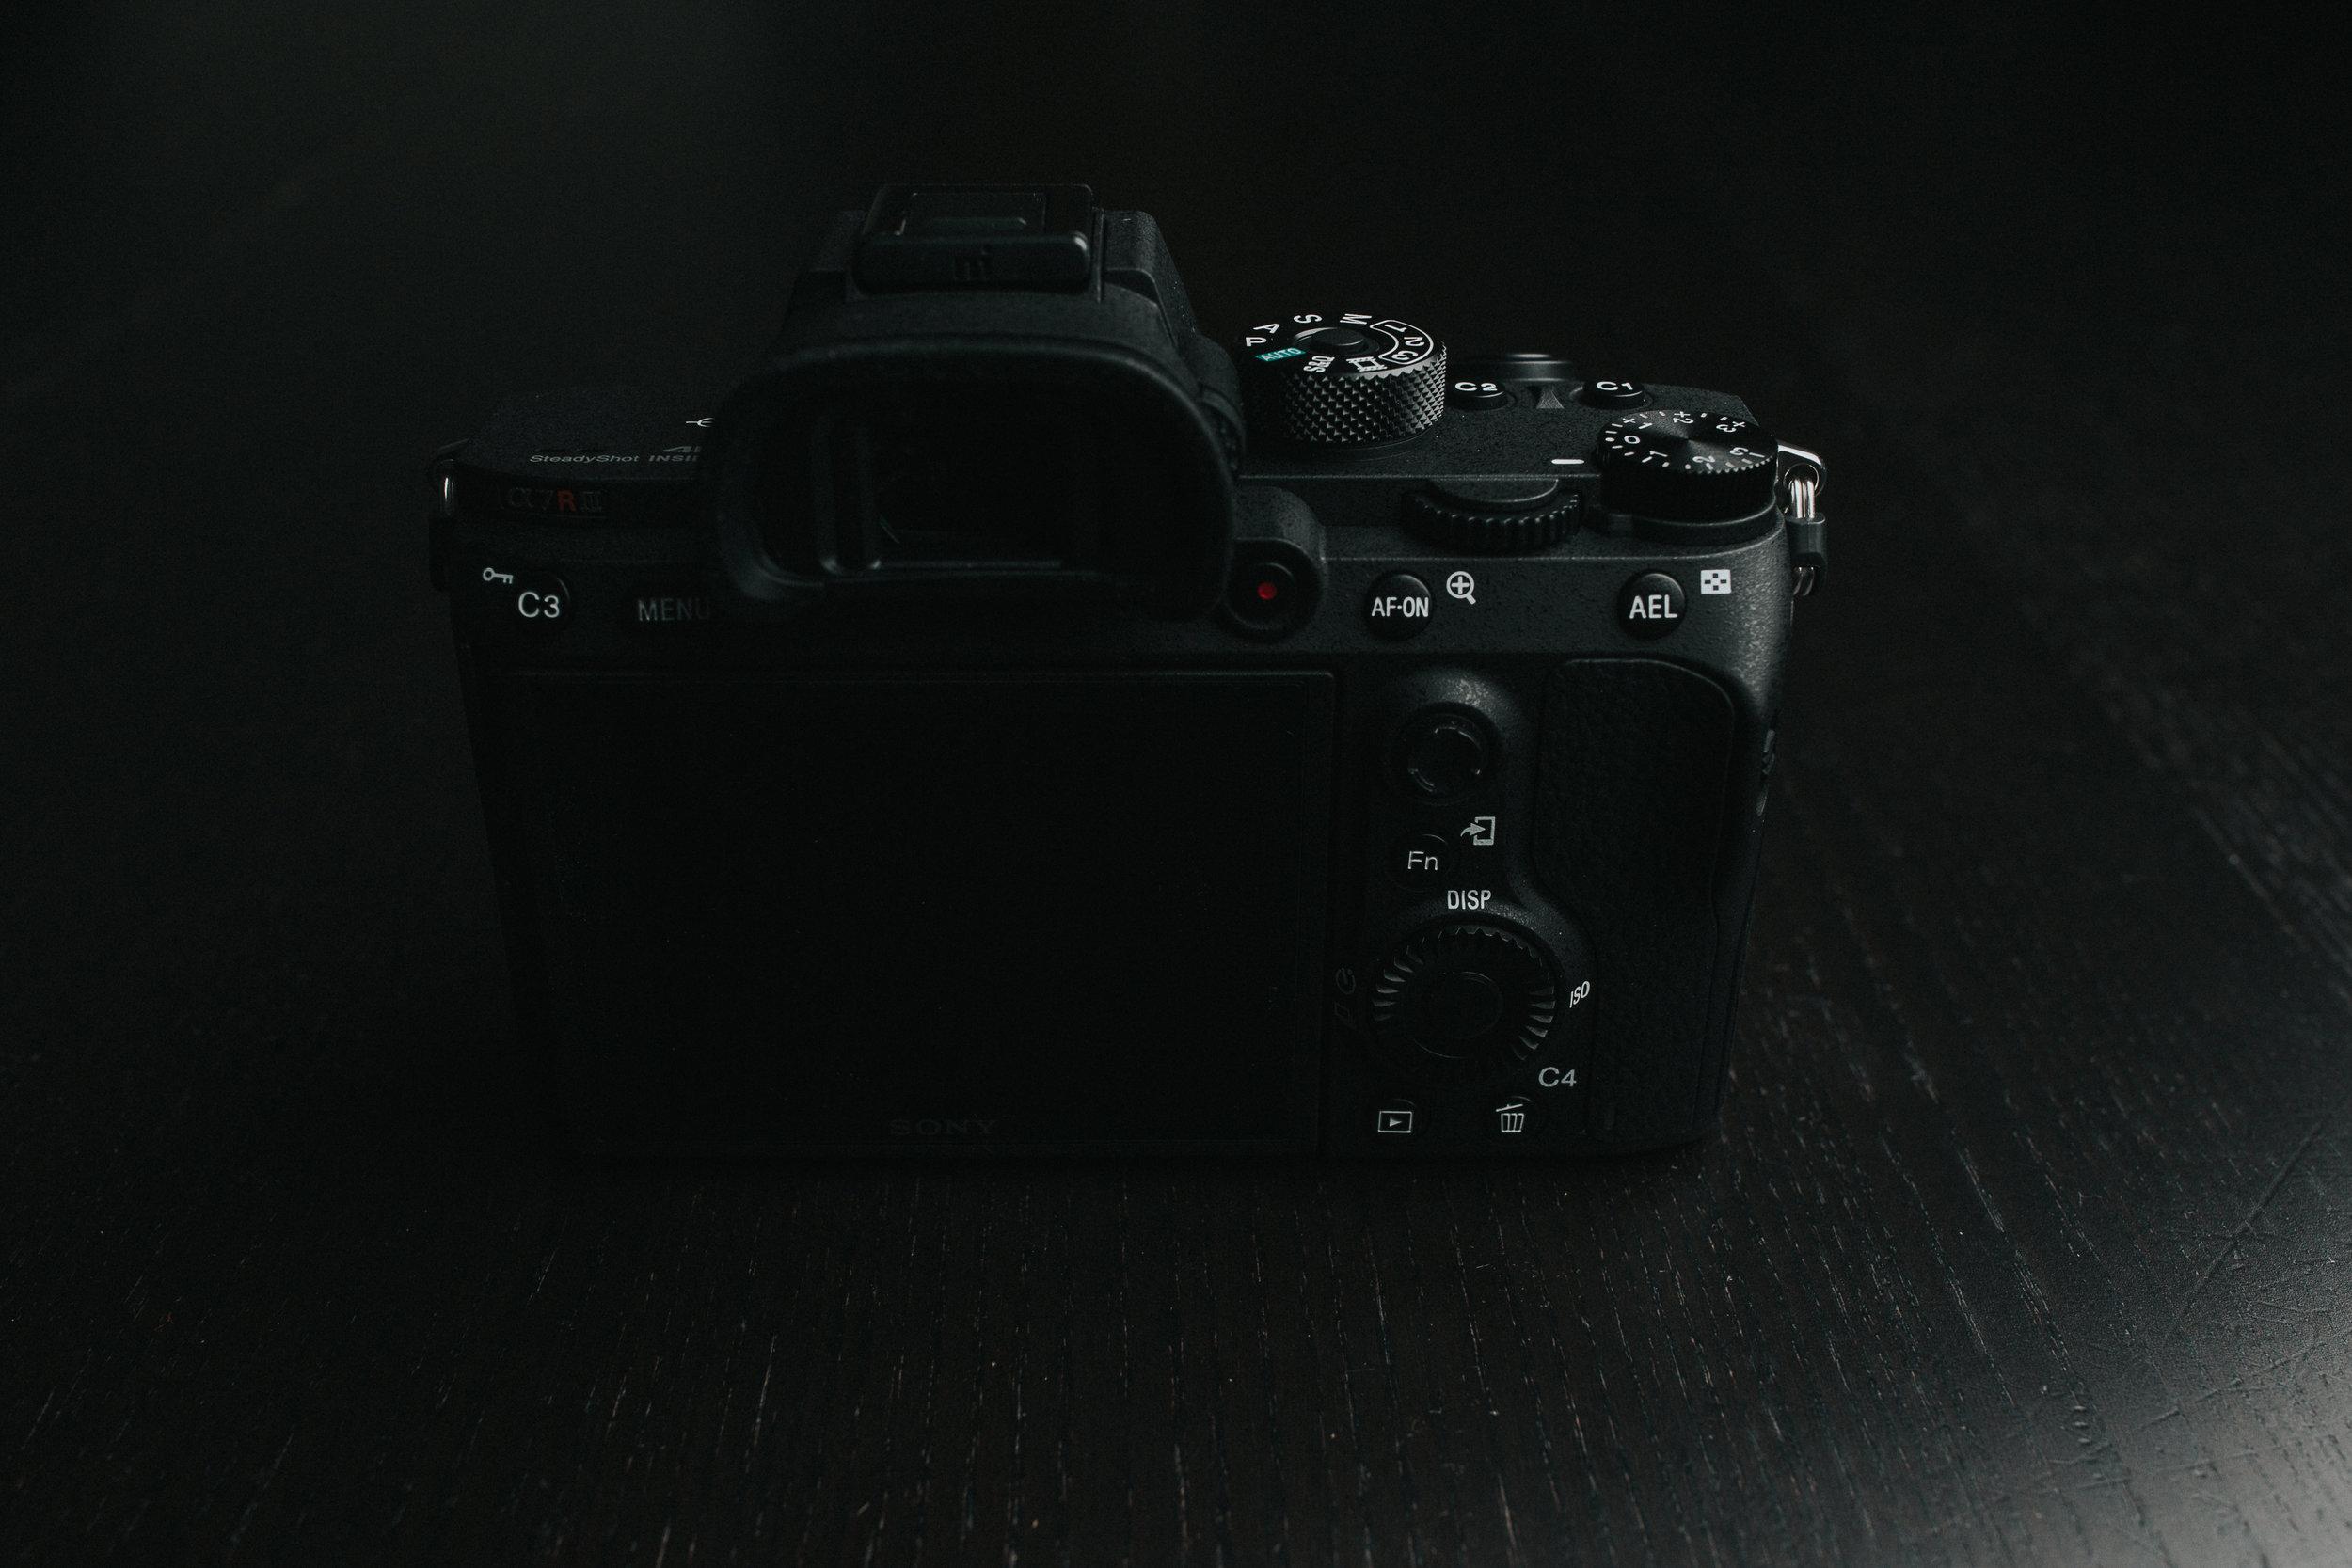 controls-3.jpg